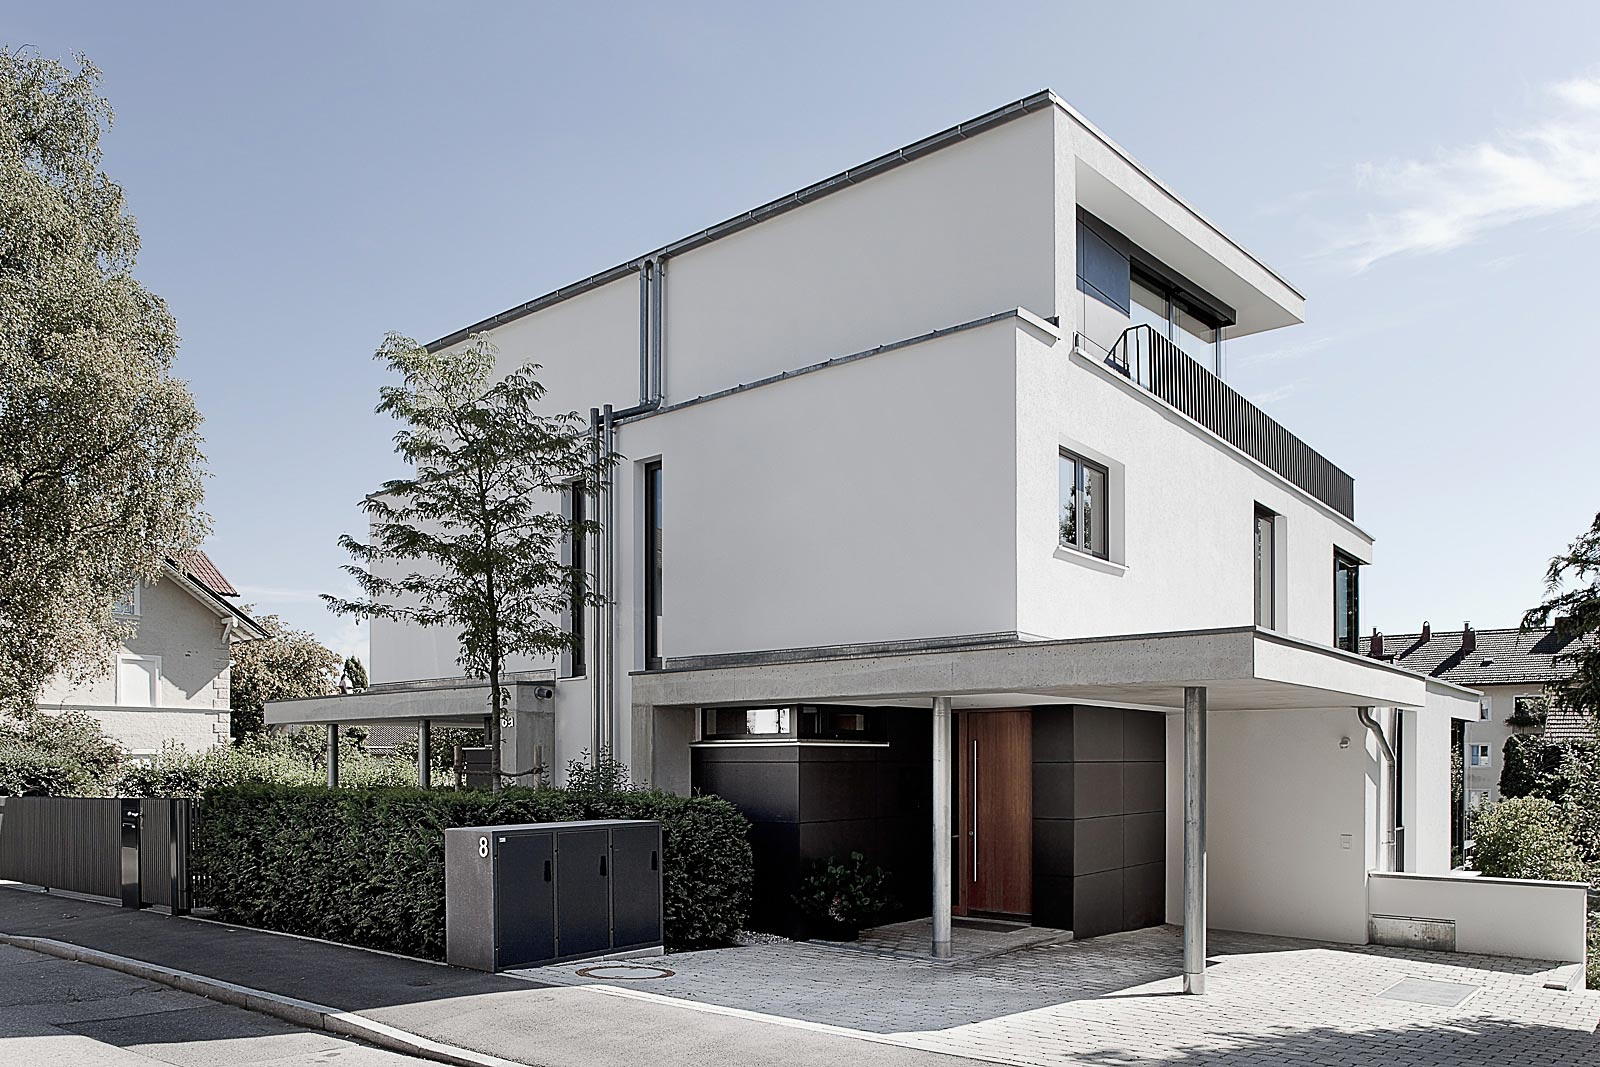 doppelhaus in starnberg kutschker leischner architekten. Black Bedroom Furniture Sets. Home Design Ideas